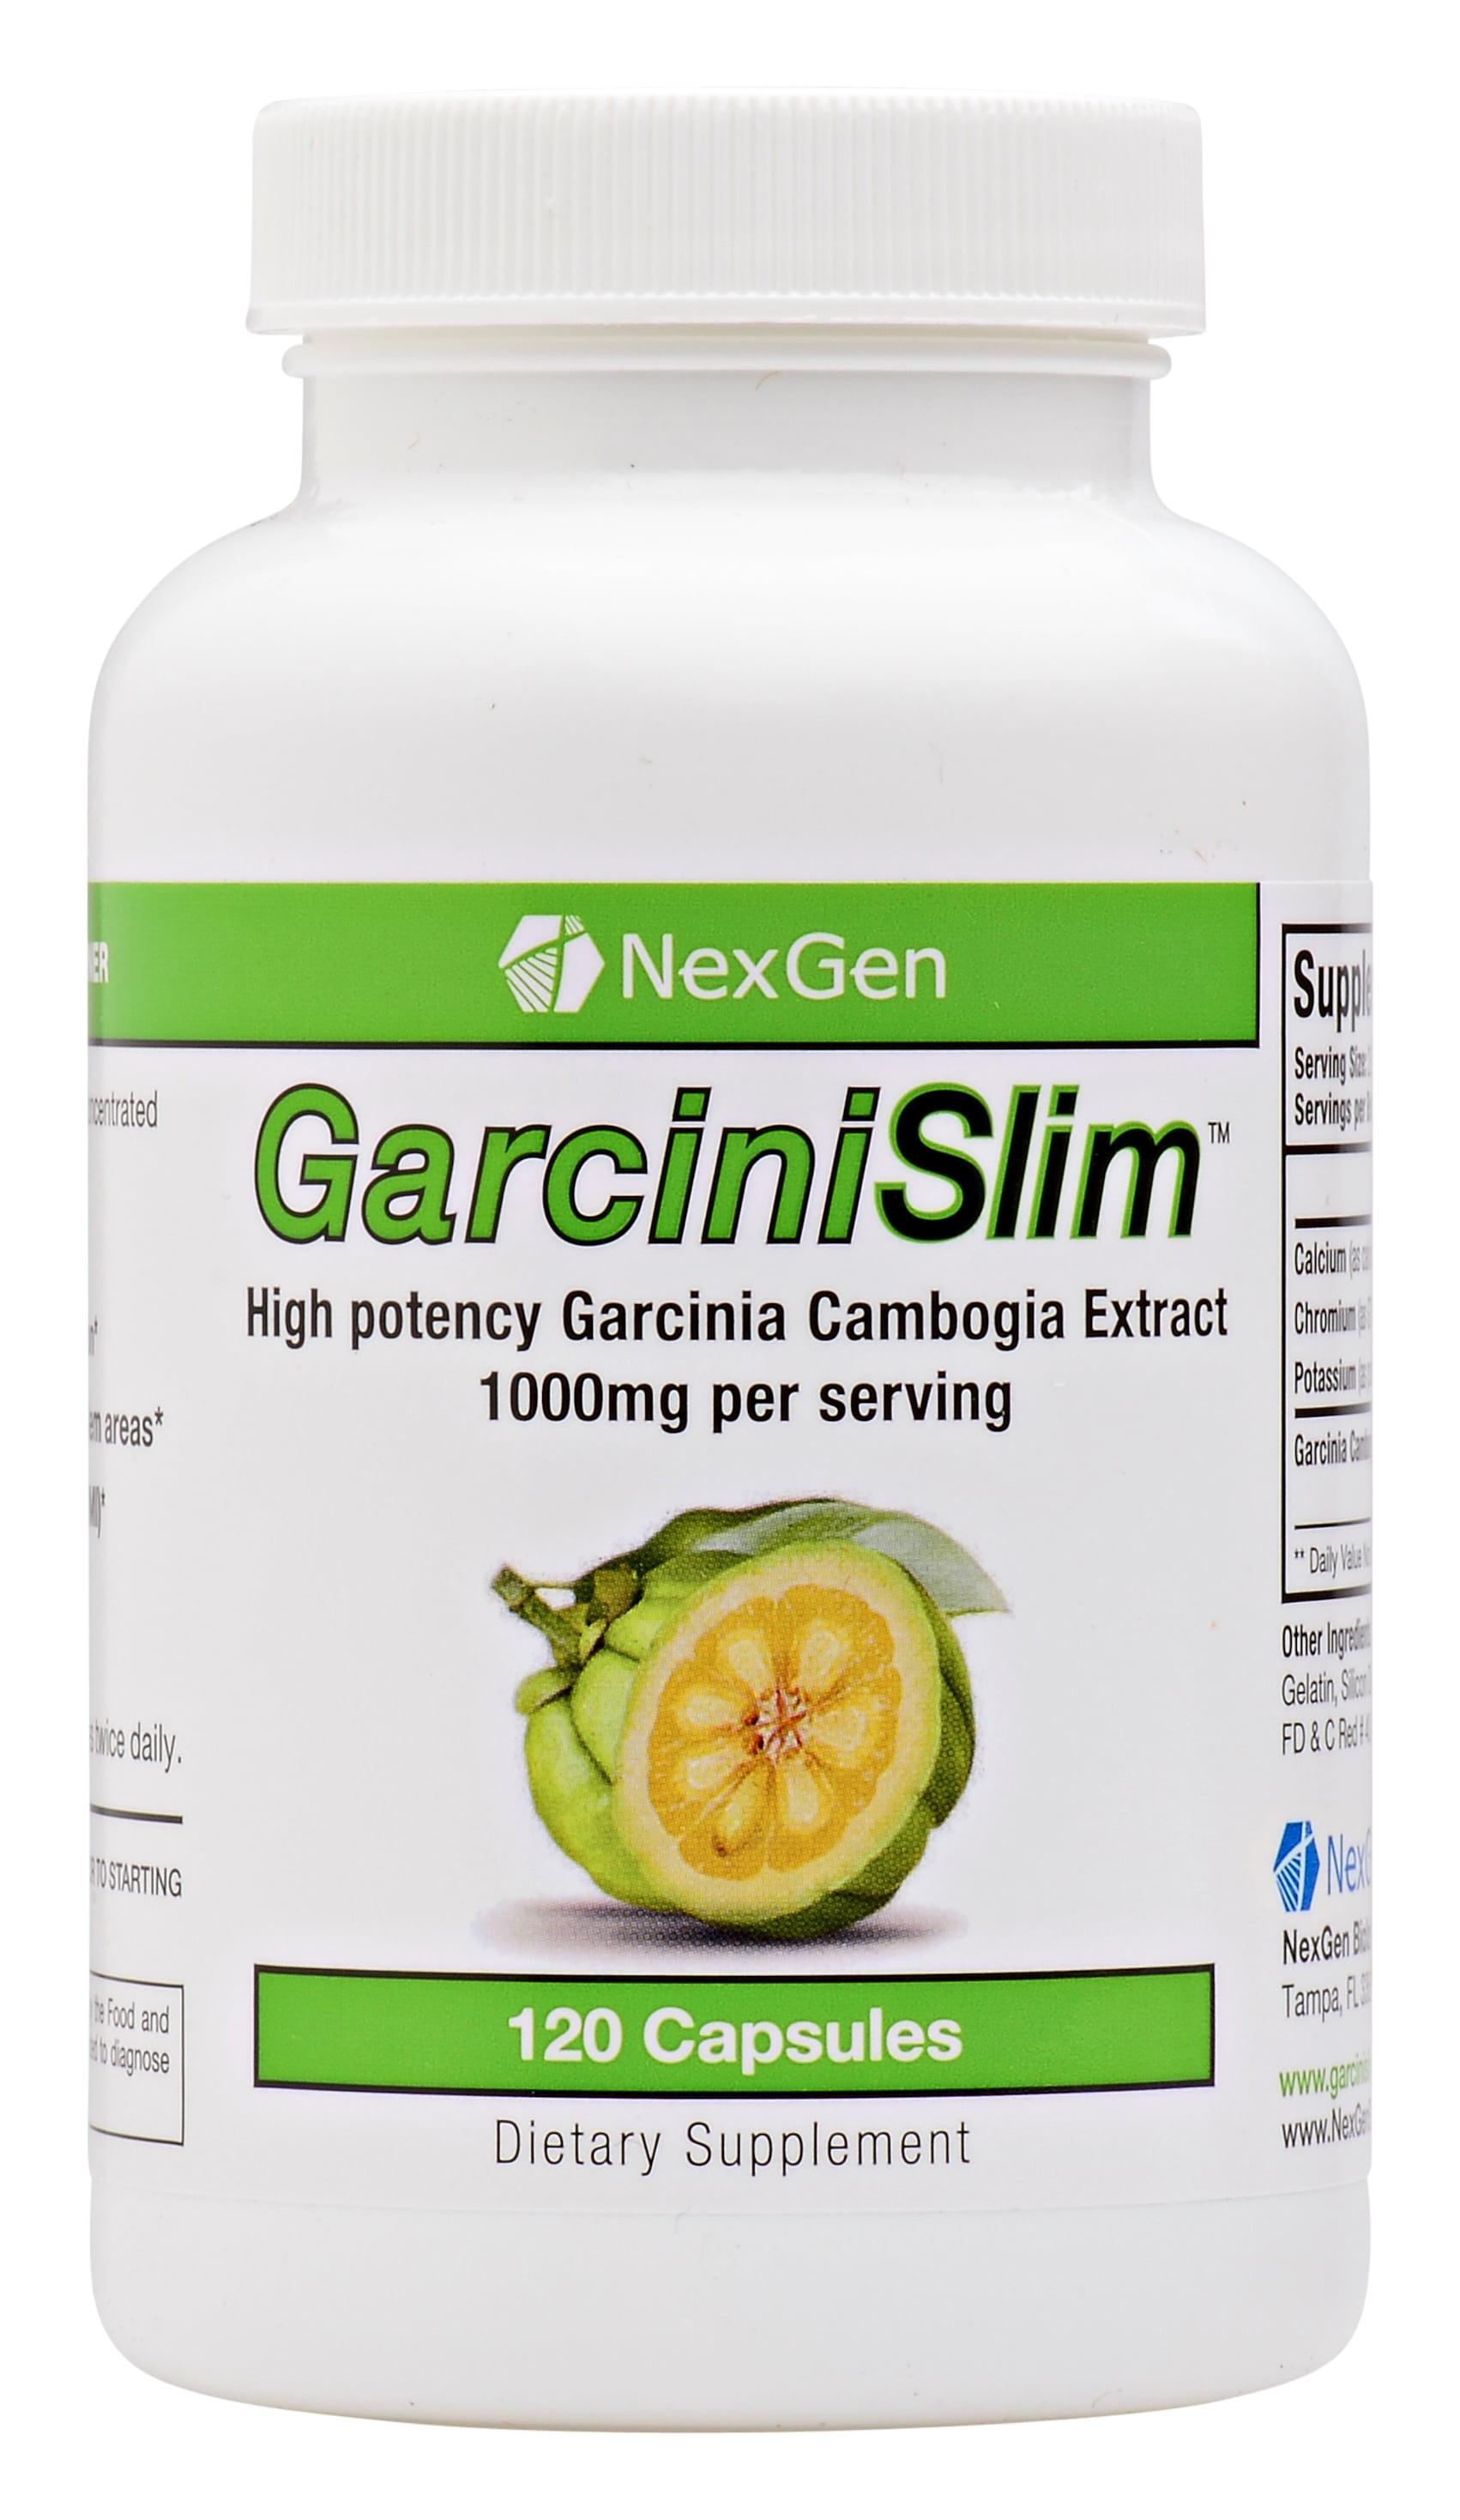 Nexgen Biolabs Garcinislim Garcinia Cambogia Extract Diet Weight Loss Pills 1000 Mg 120 Capsules Walmart Com Walmart Com